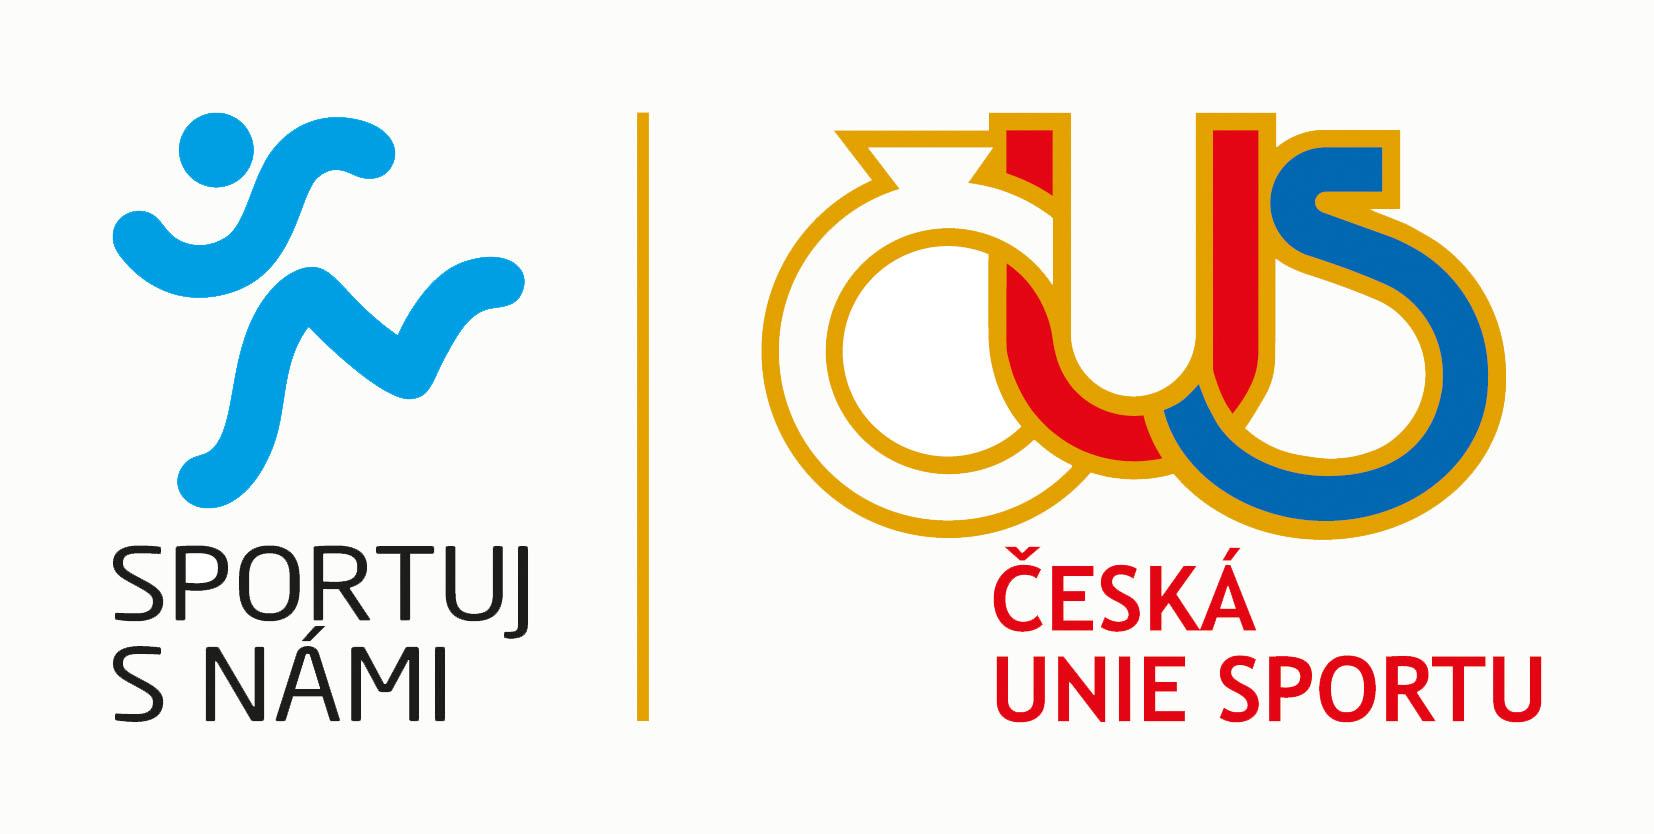 Sportuj s námi, česká unie sportu